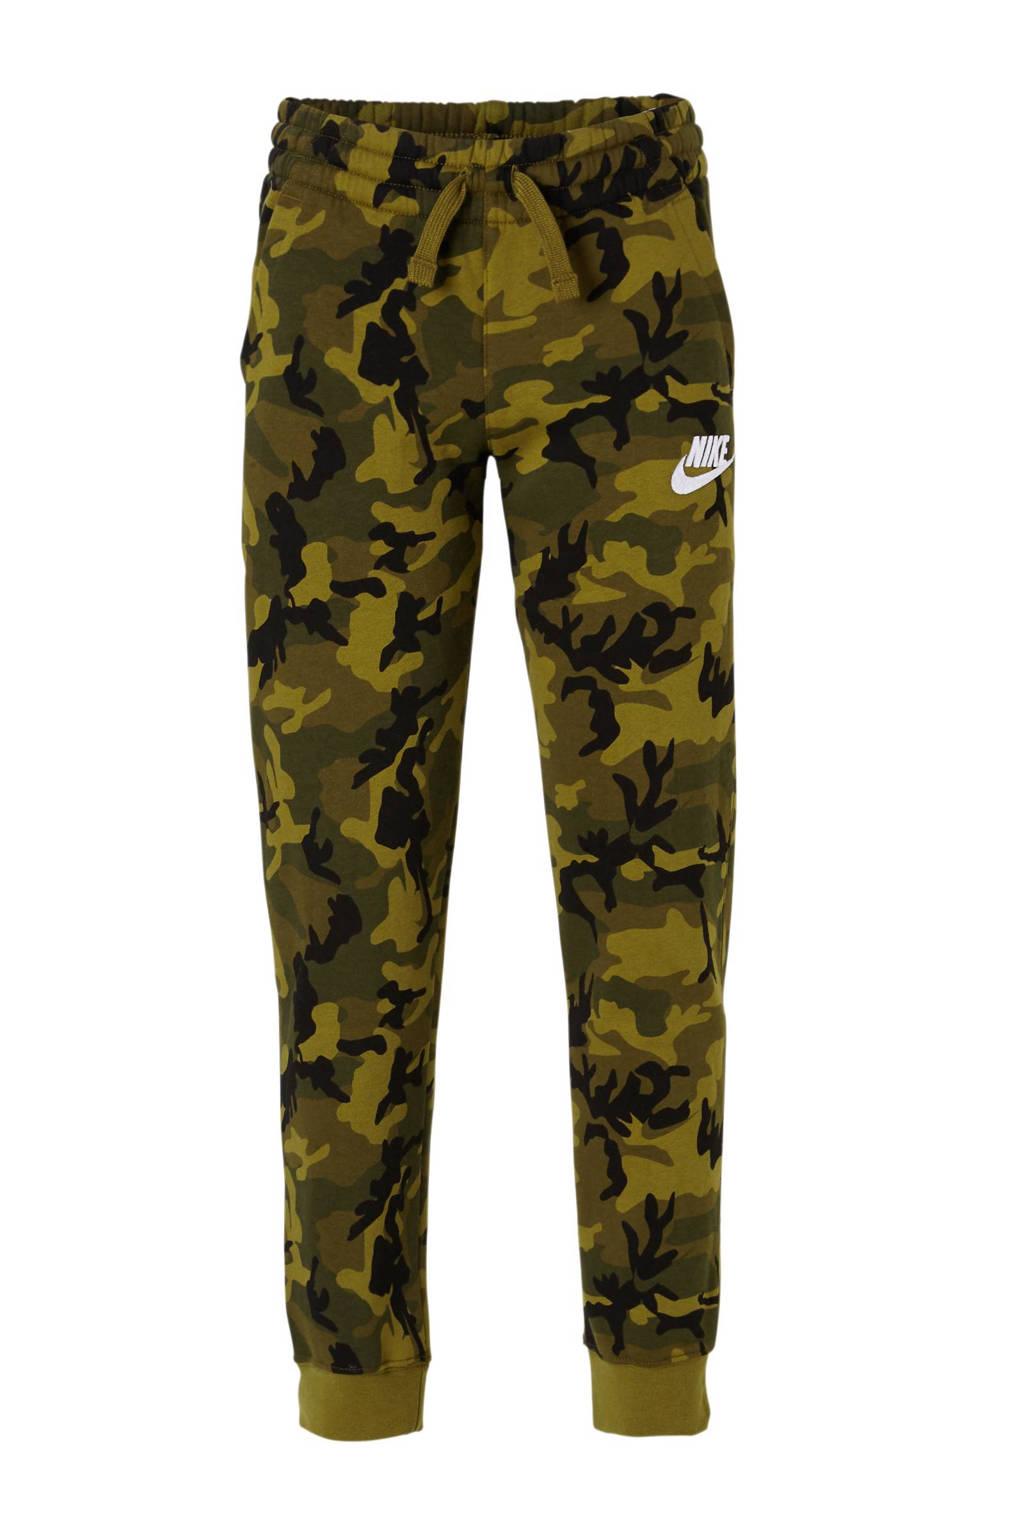 Nike   joggingbroek camouflage groen, Groen